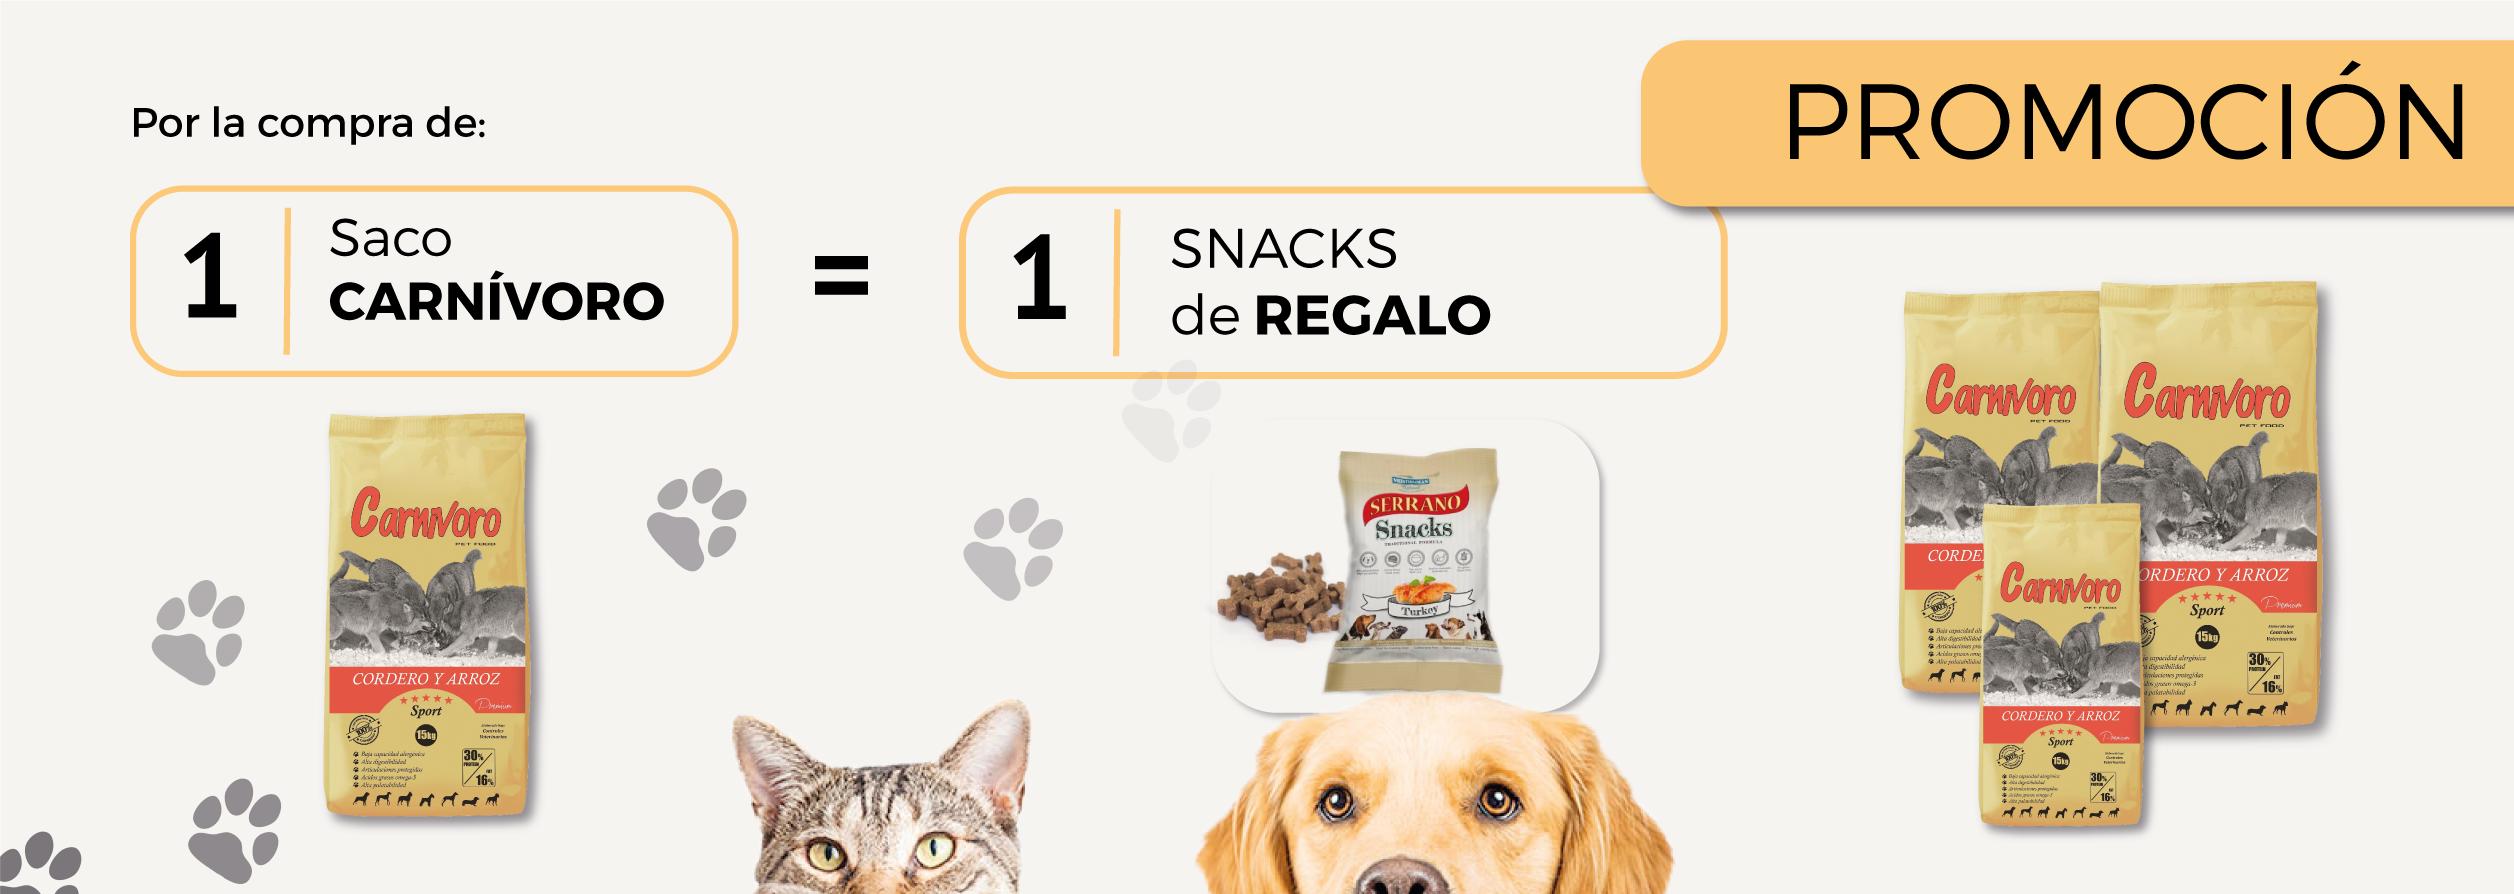 Promo carnívoro snacks